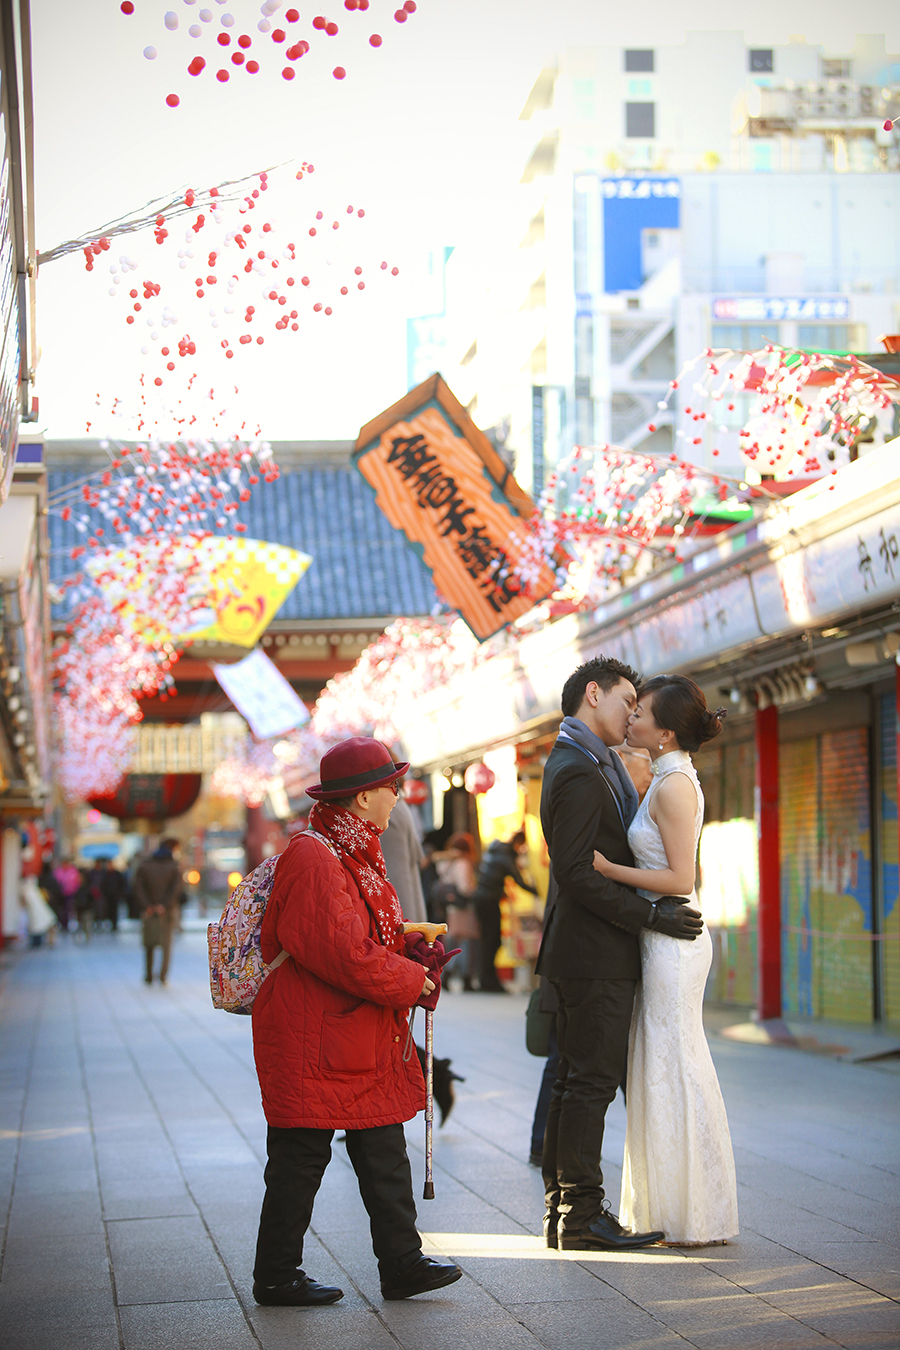 hokkaido tokyo japan . wedding photography by kurt ahs . 5089.jpg